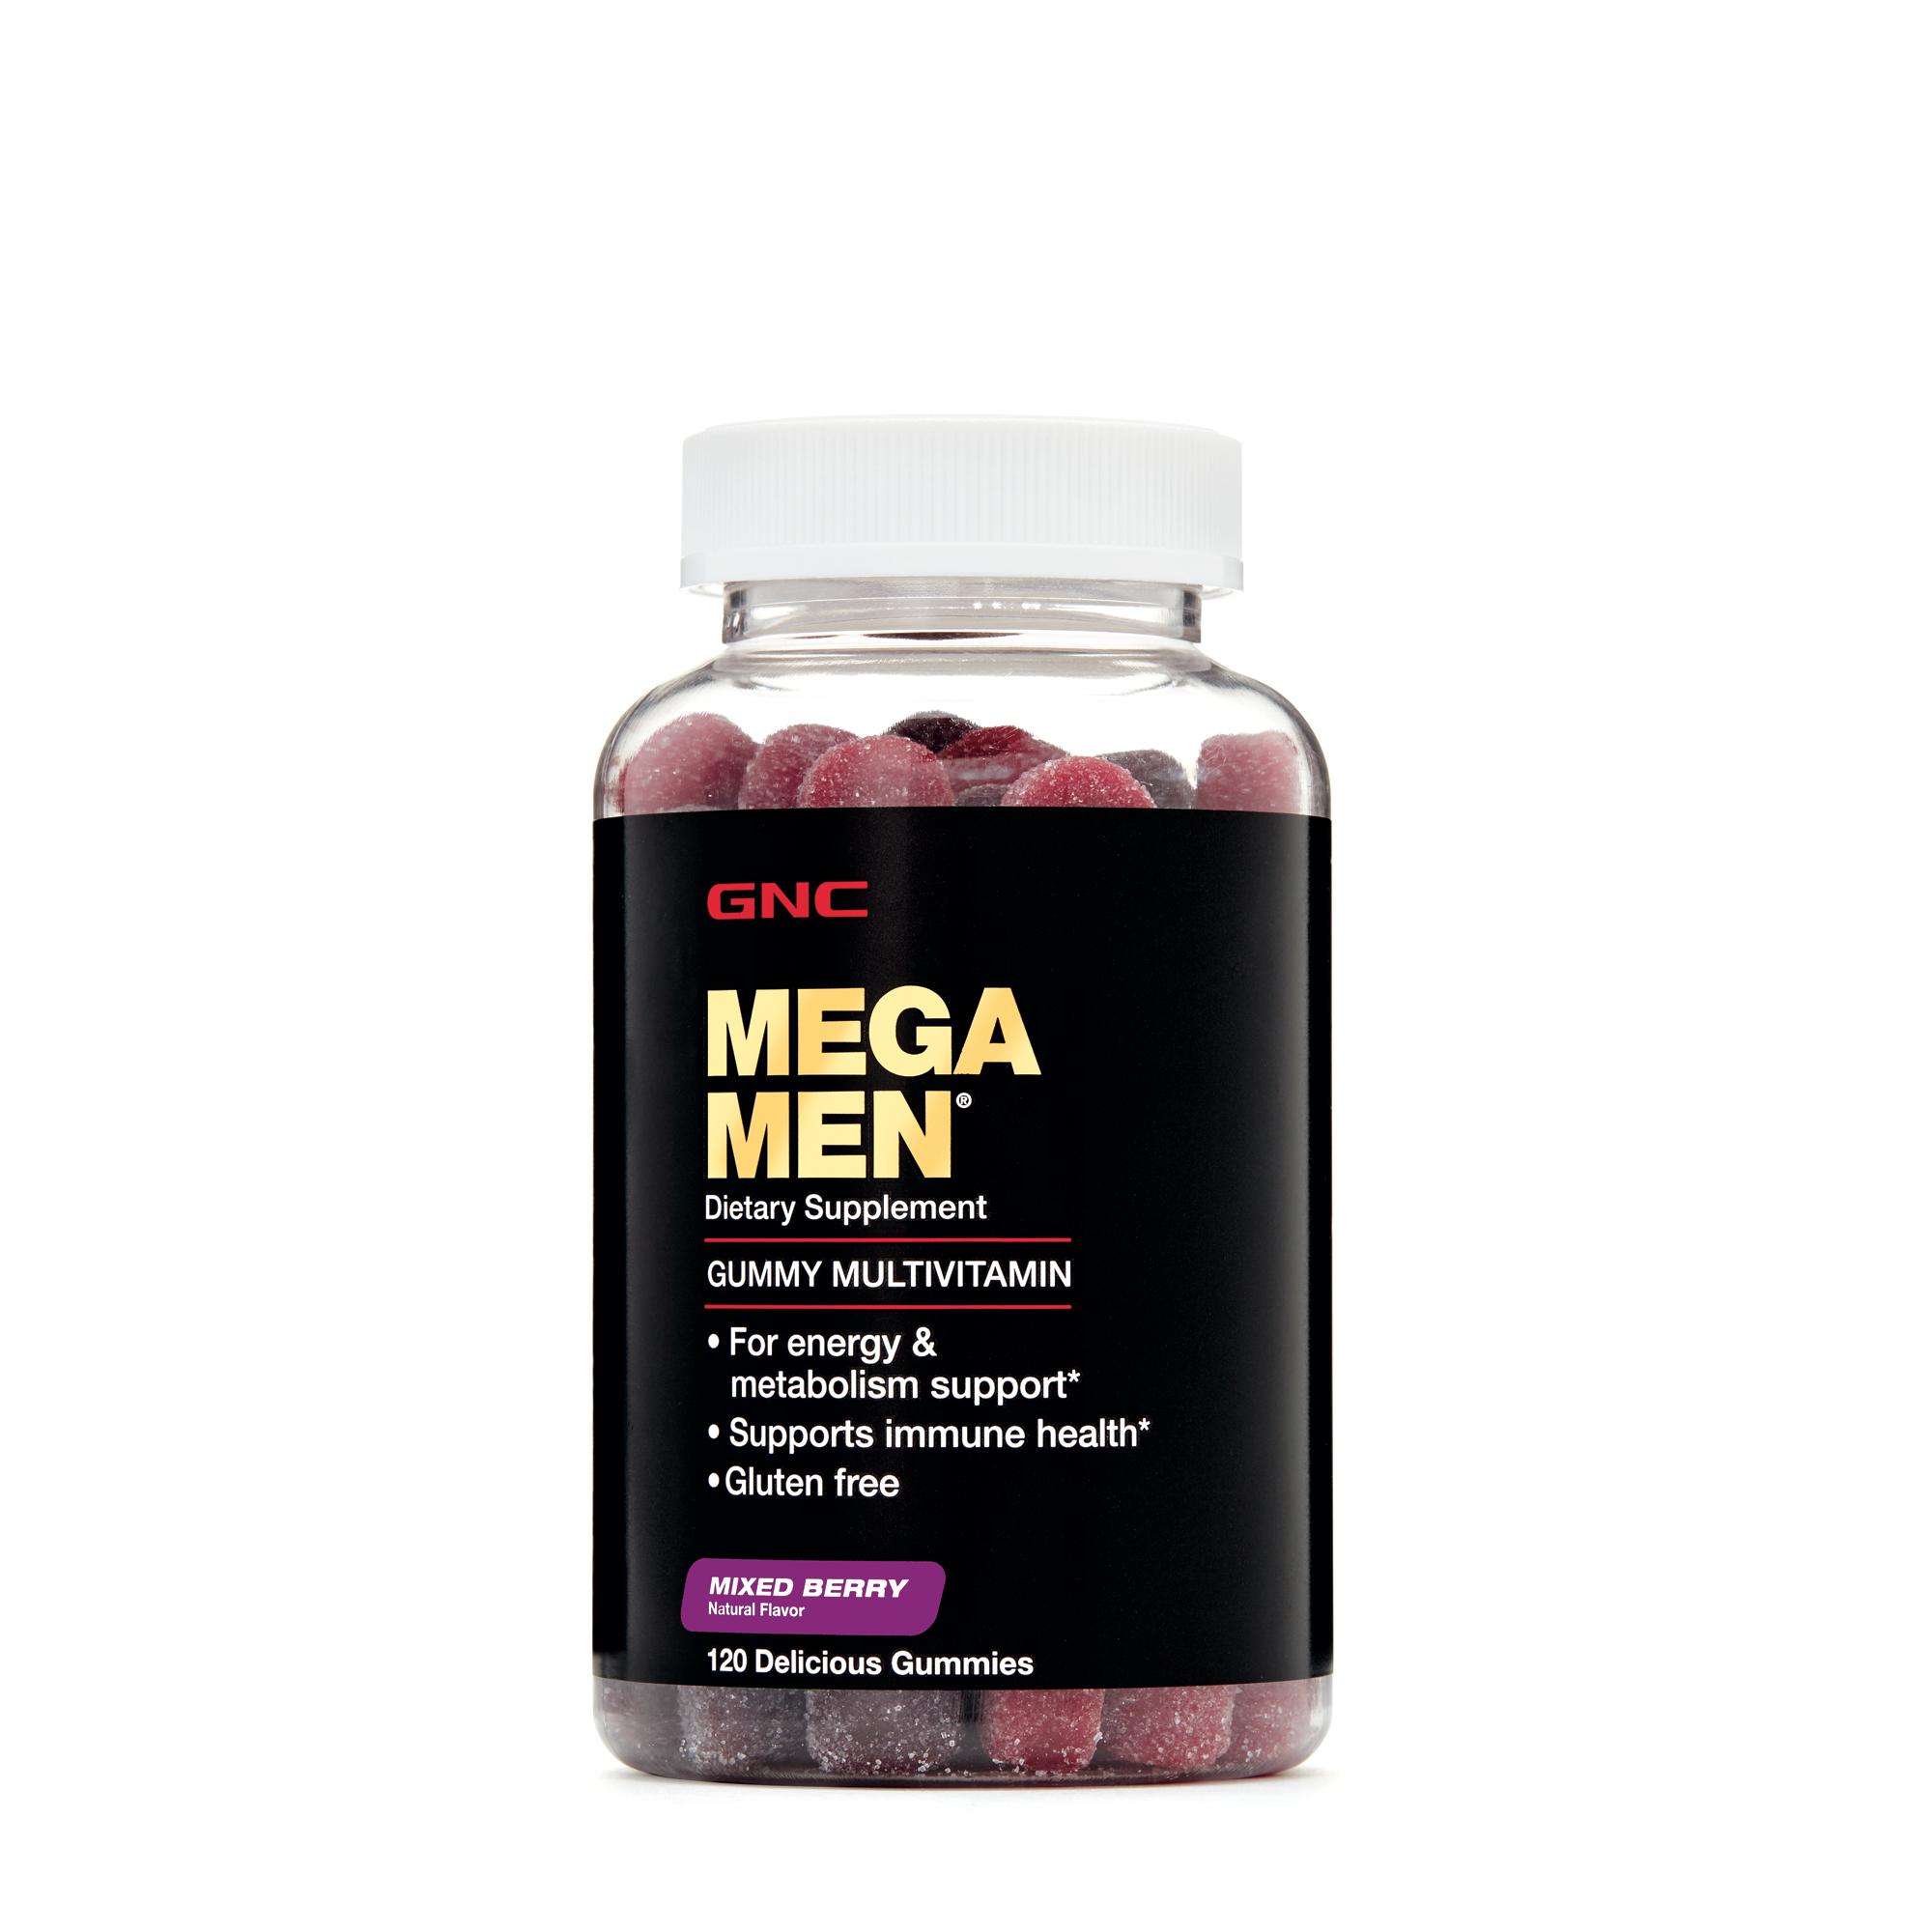 Gnc Mega Men Gummy Multivitamin Mixed Berry Vitamins For Wellness Kids 30 Gummies